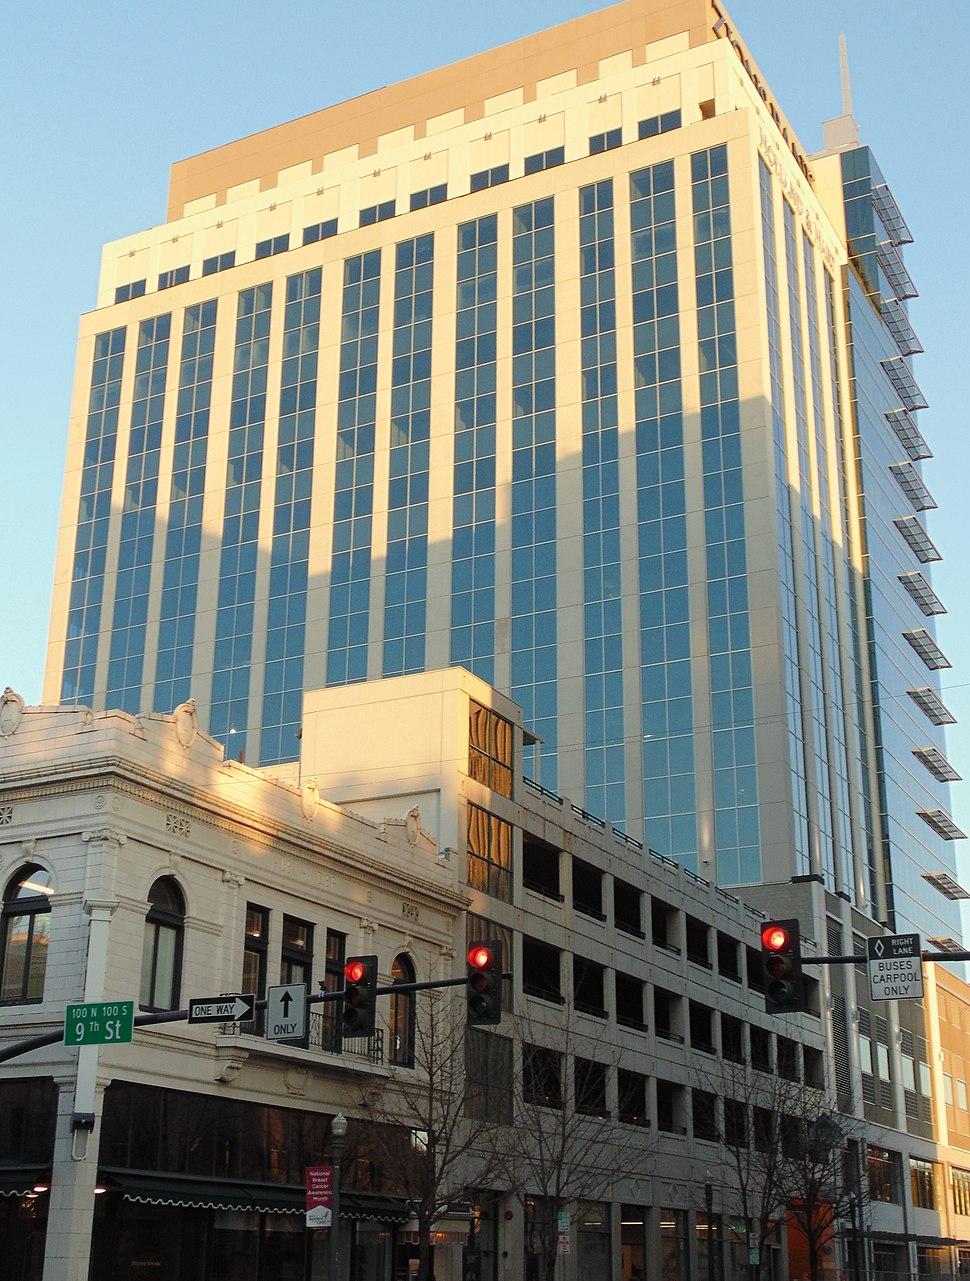 Zions Bank Building in Boise